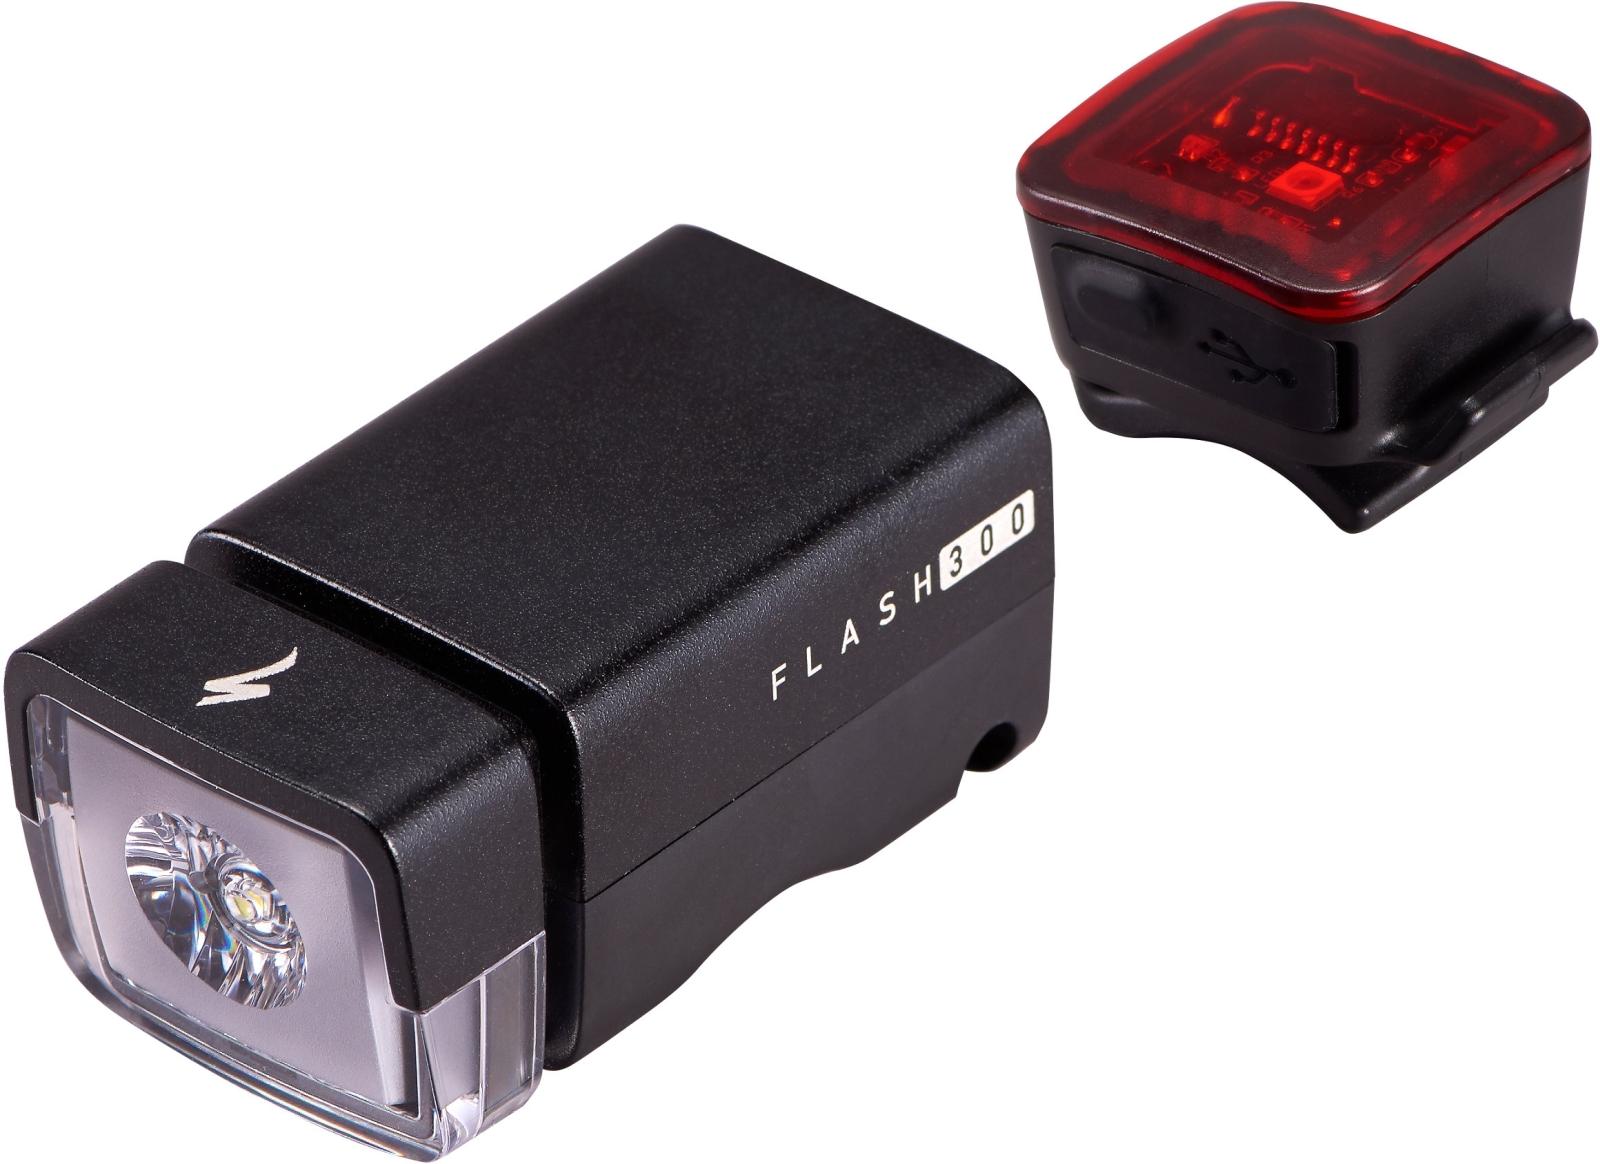 Specialized Flash Pack Headlight/Taillight - black uni